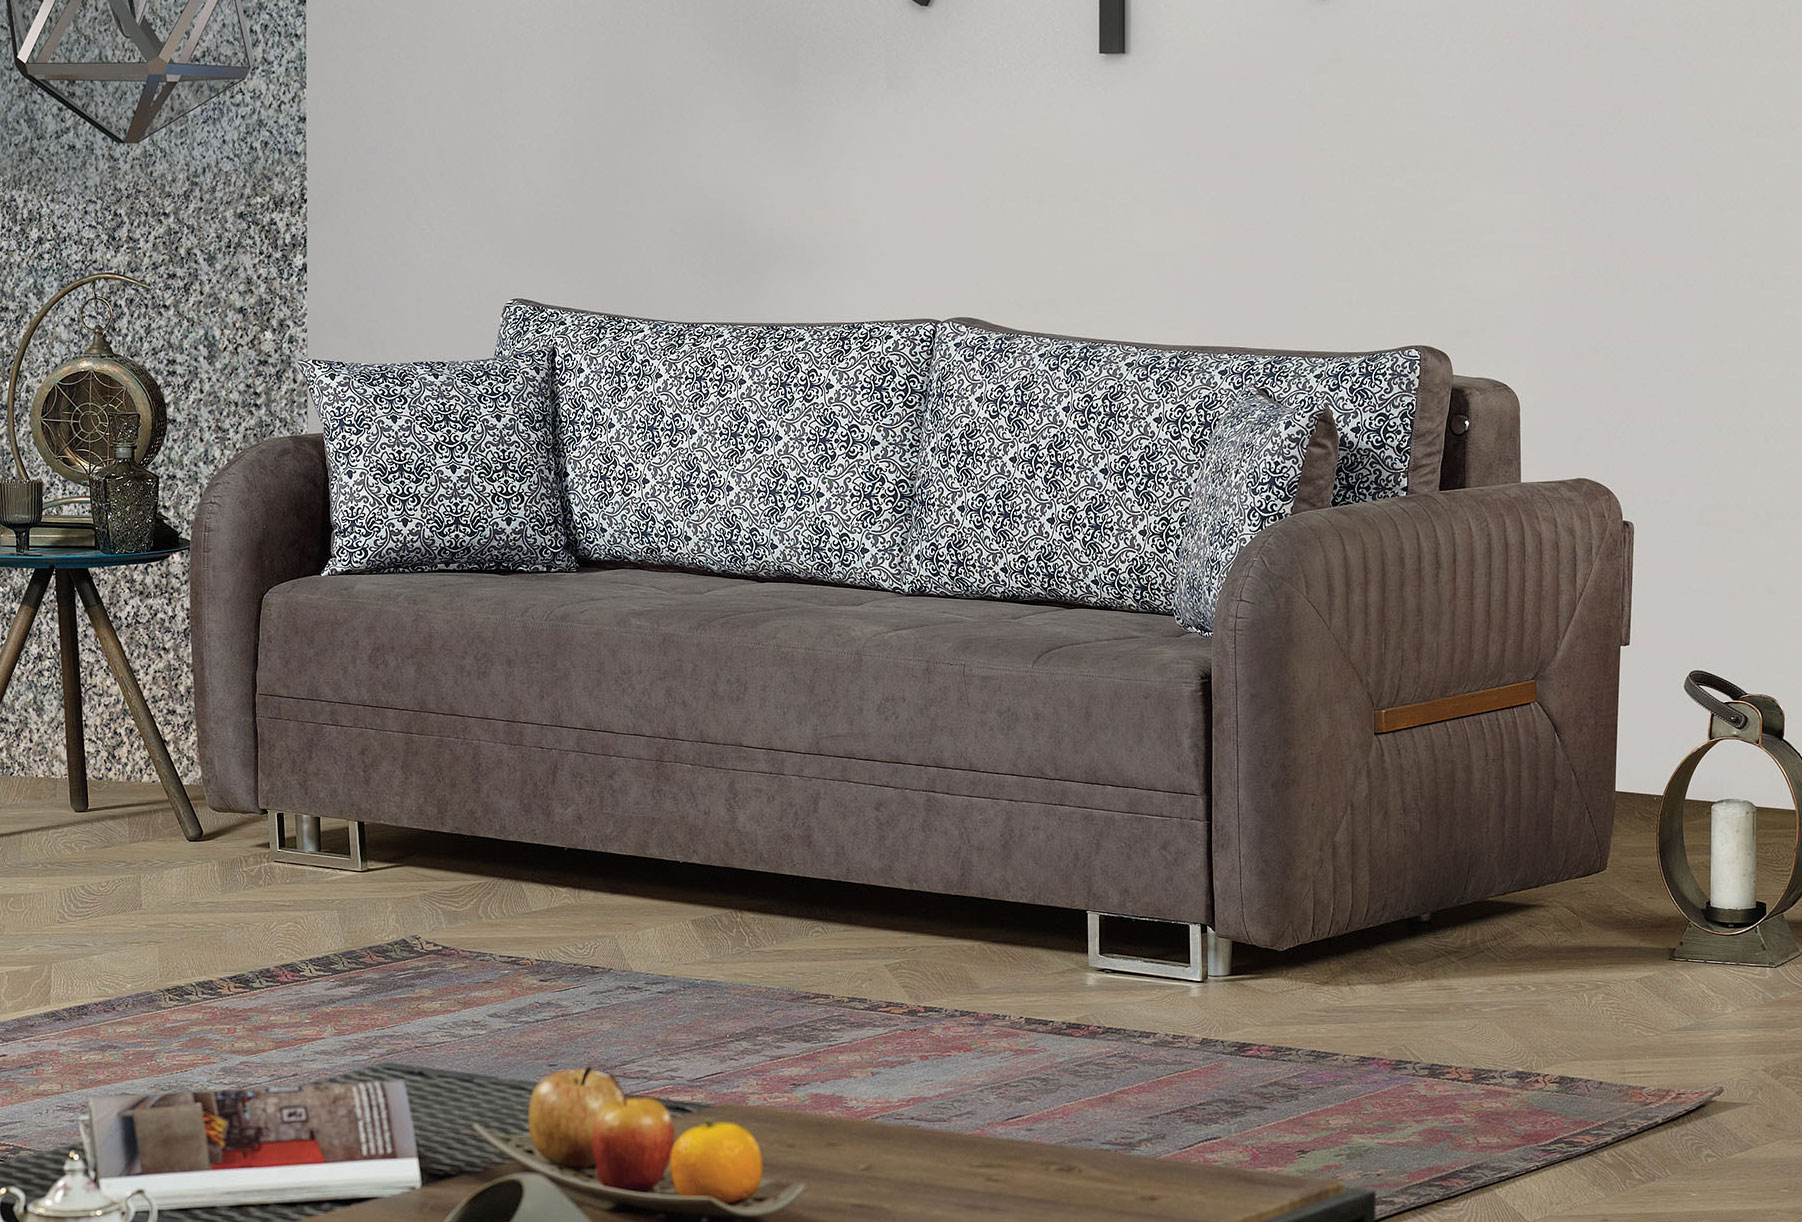 Sensational Barcelona Gray Convertible Sofa Bed By Casamode Evergreenethics Interior Chair Design Evergreenethicsorg